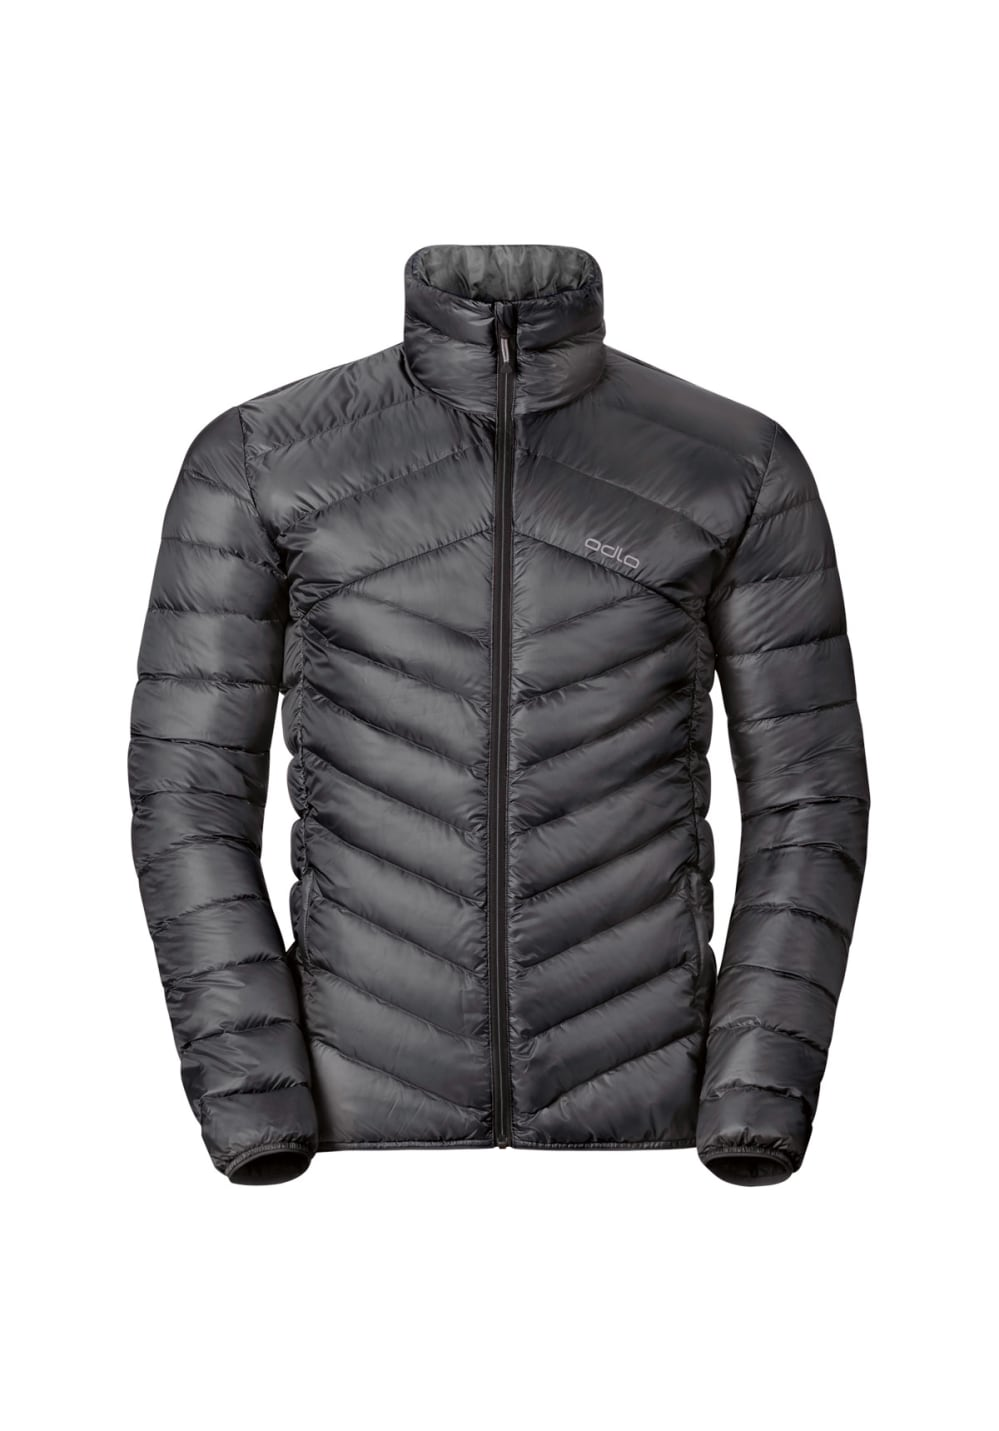 Odlo Jacket Air Cocoon - Laufjacken für Herren - Schwarz, Gr. L